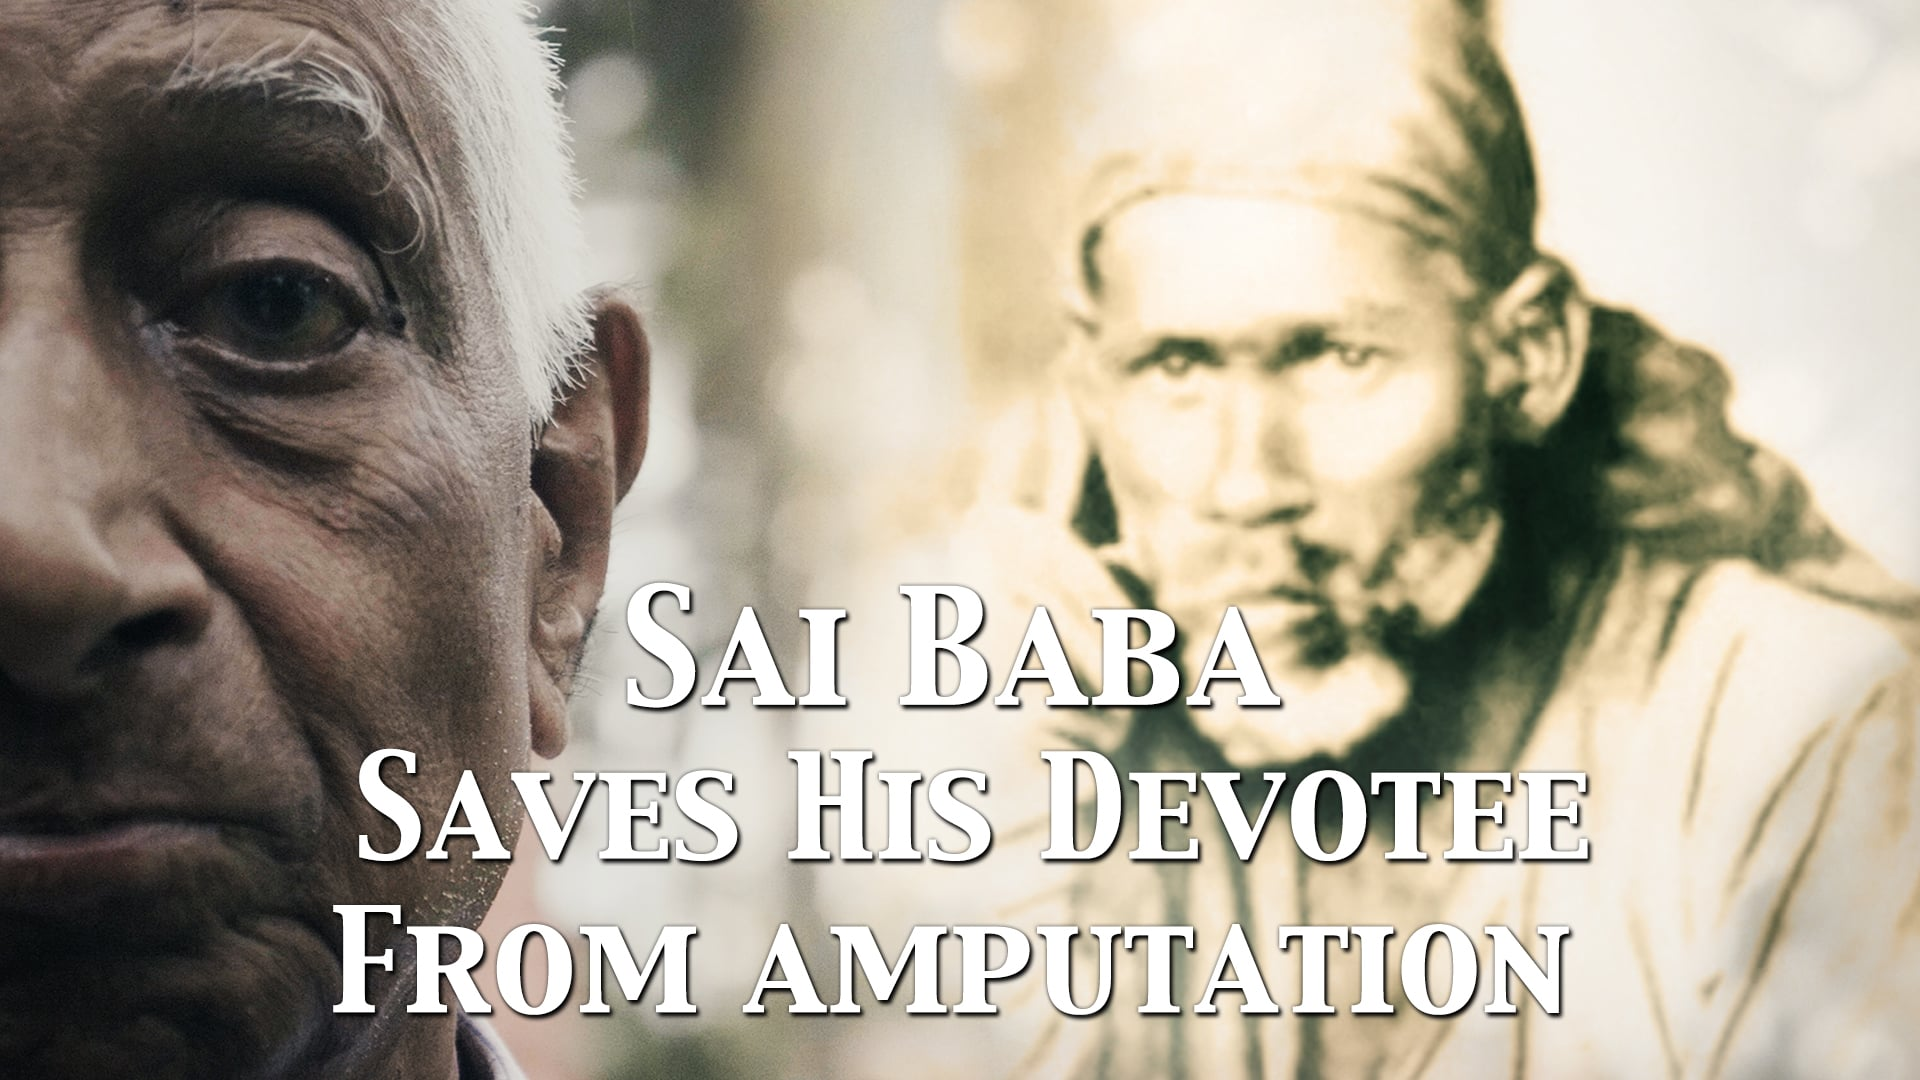 Sai Baba saves His devotee from amputation